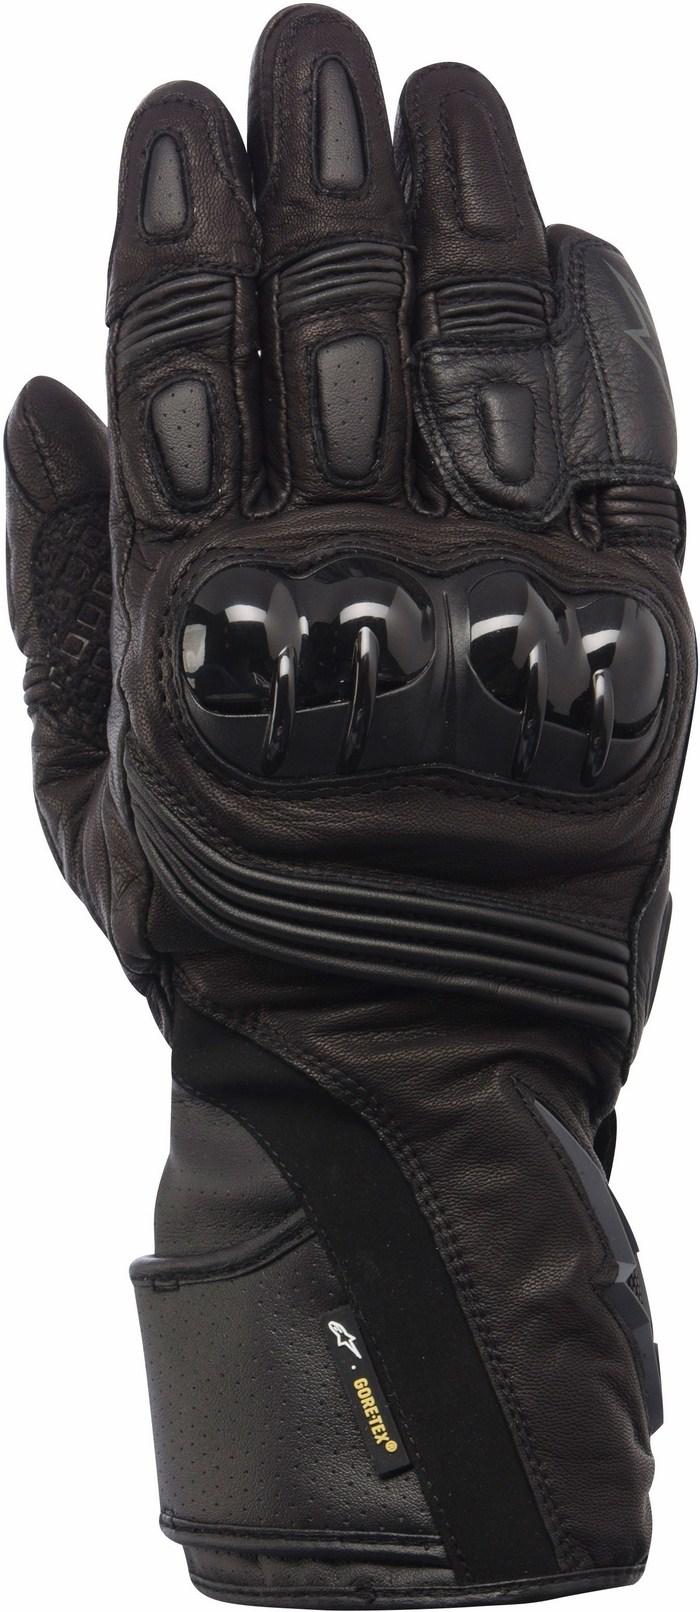 Alpinestars Archer X-Trafit gloves black